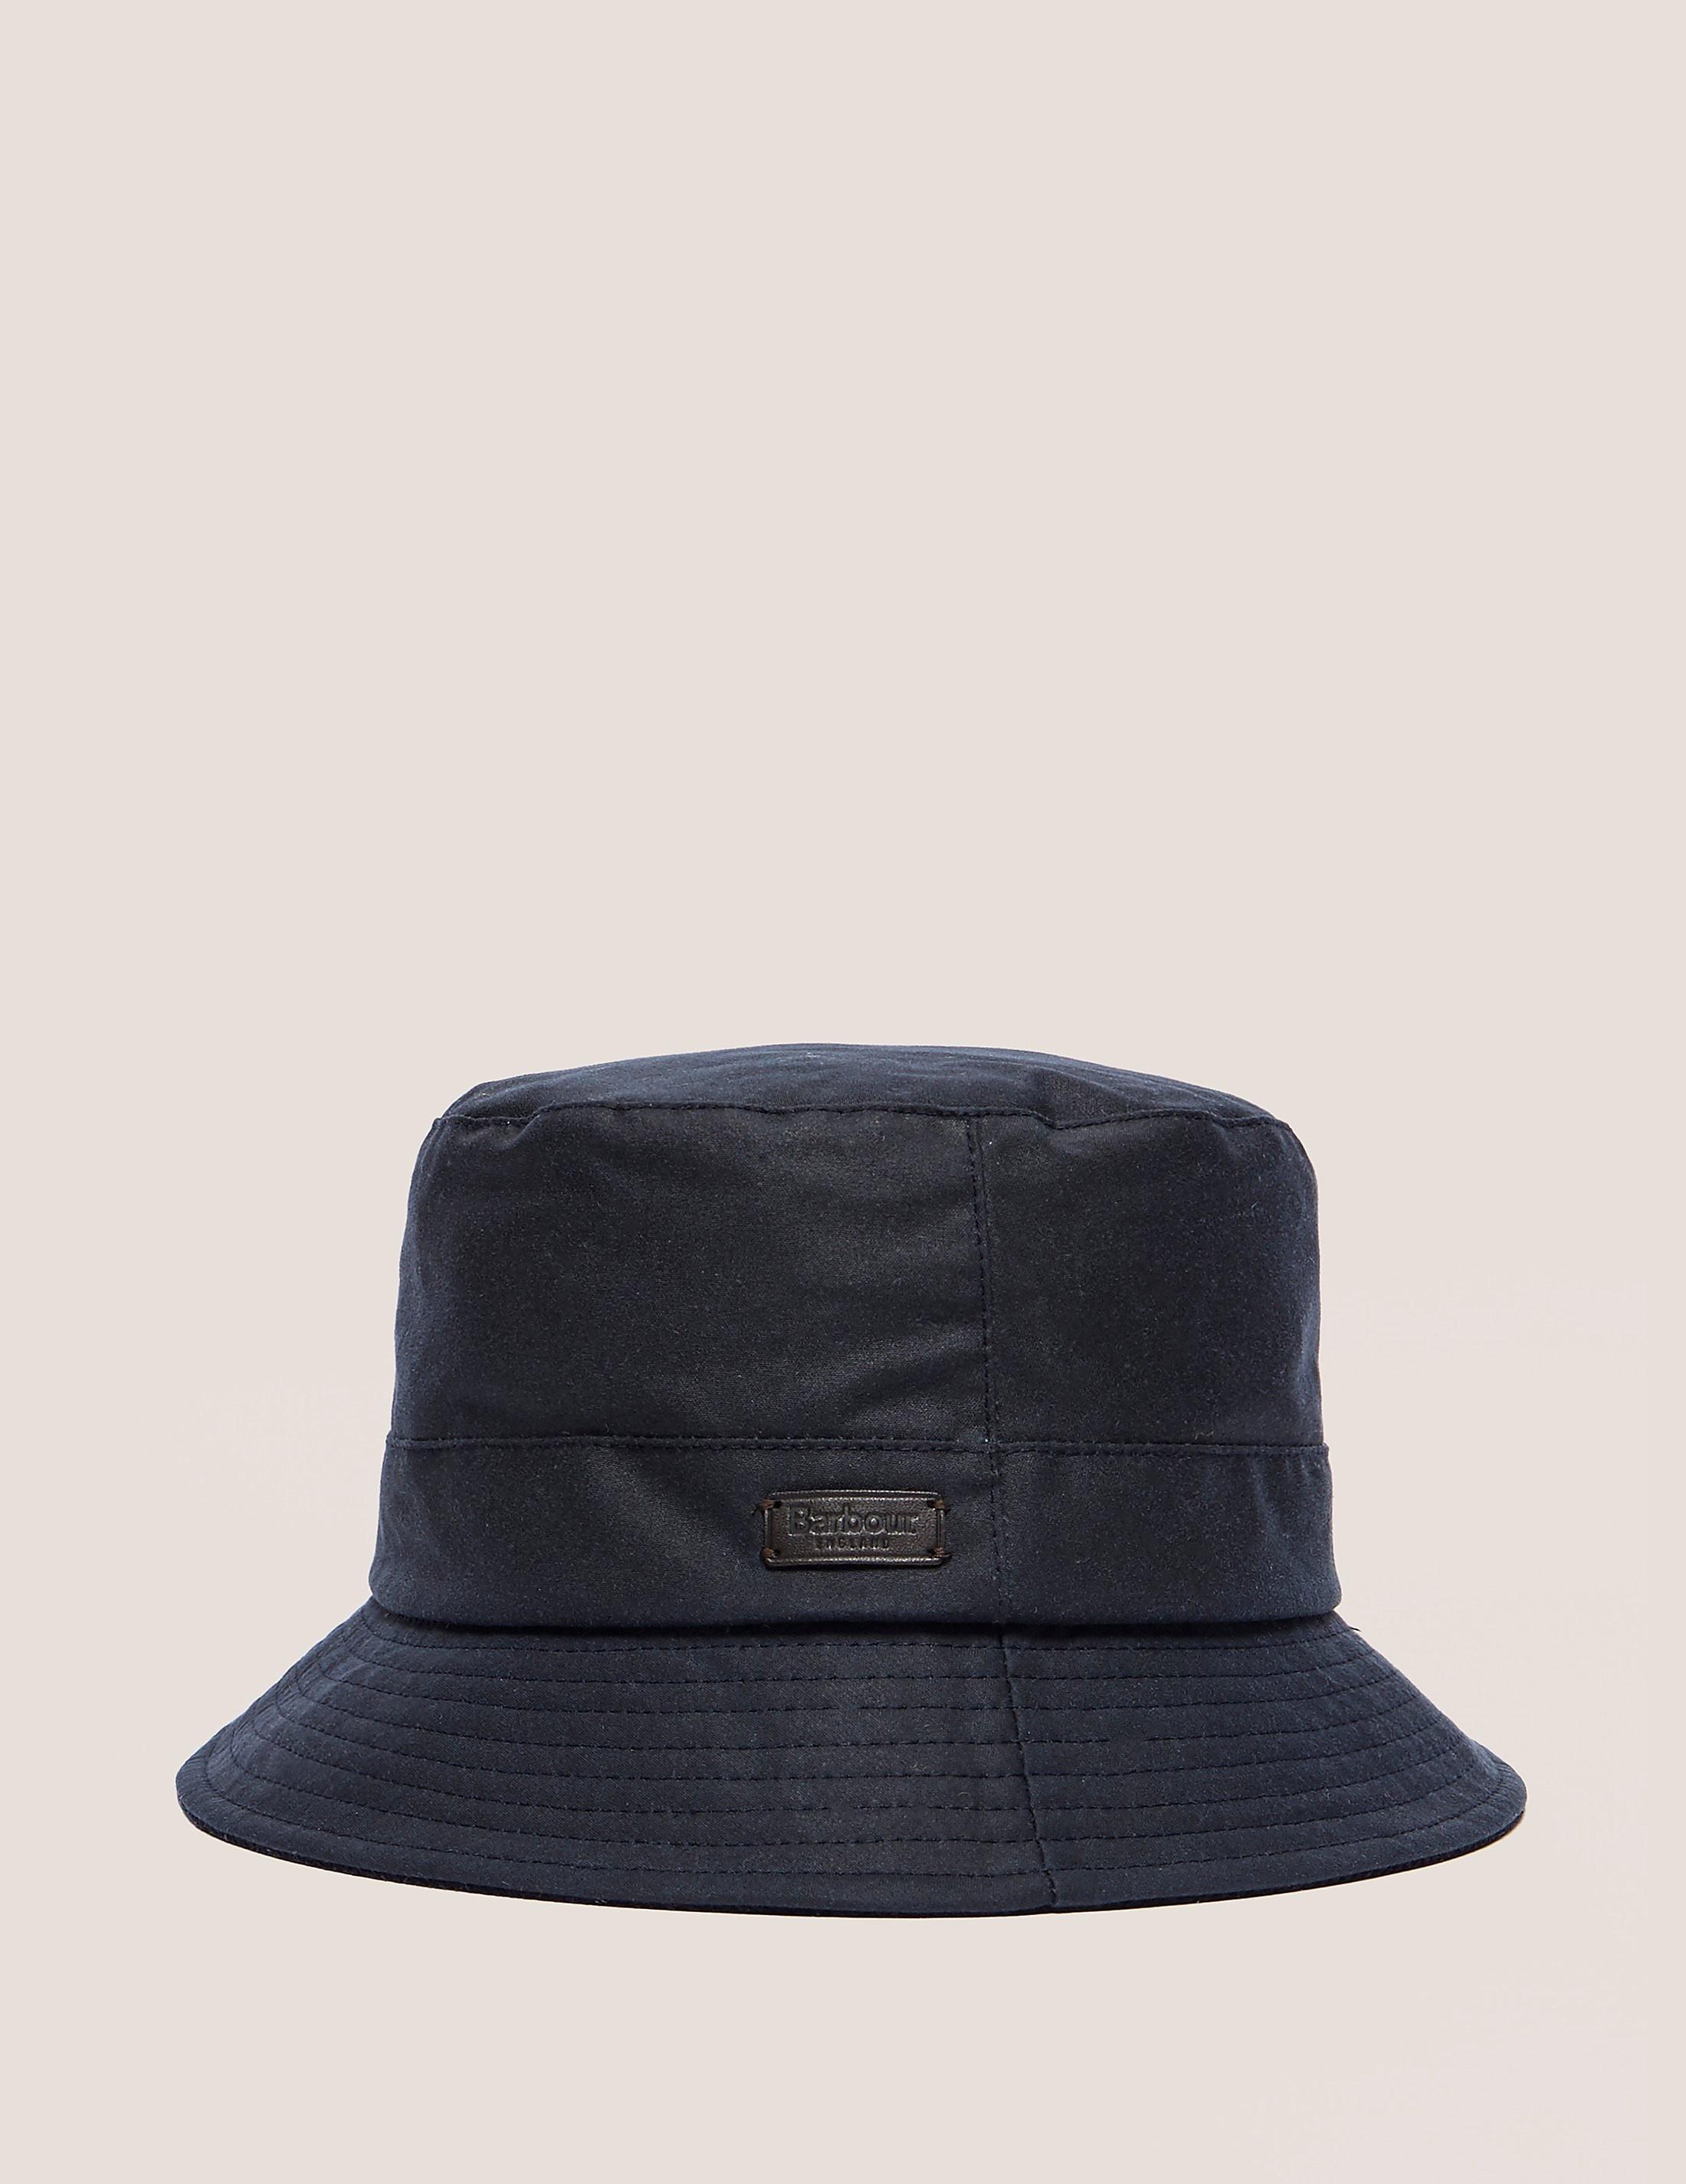 Barbour Devon Bucket Hat